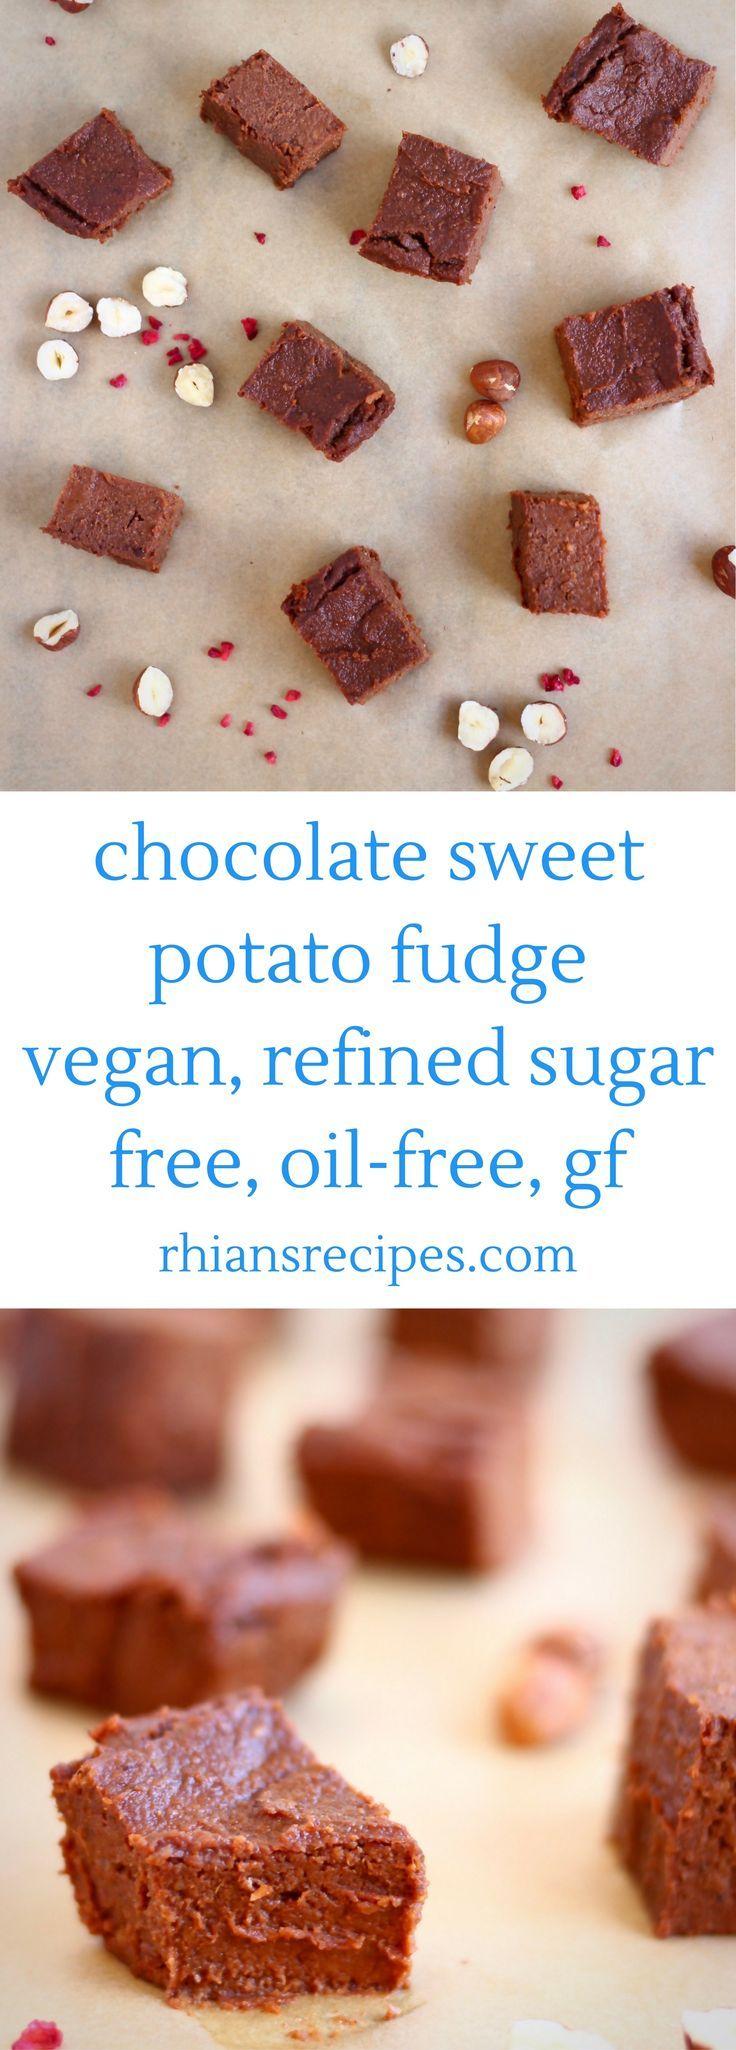 Chocolate Sweet Potato Fudge - super indulgent and secretly healthy. Vegan, refined sugar free, gluten-free + oil-free